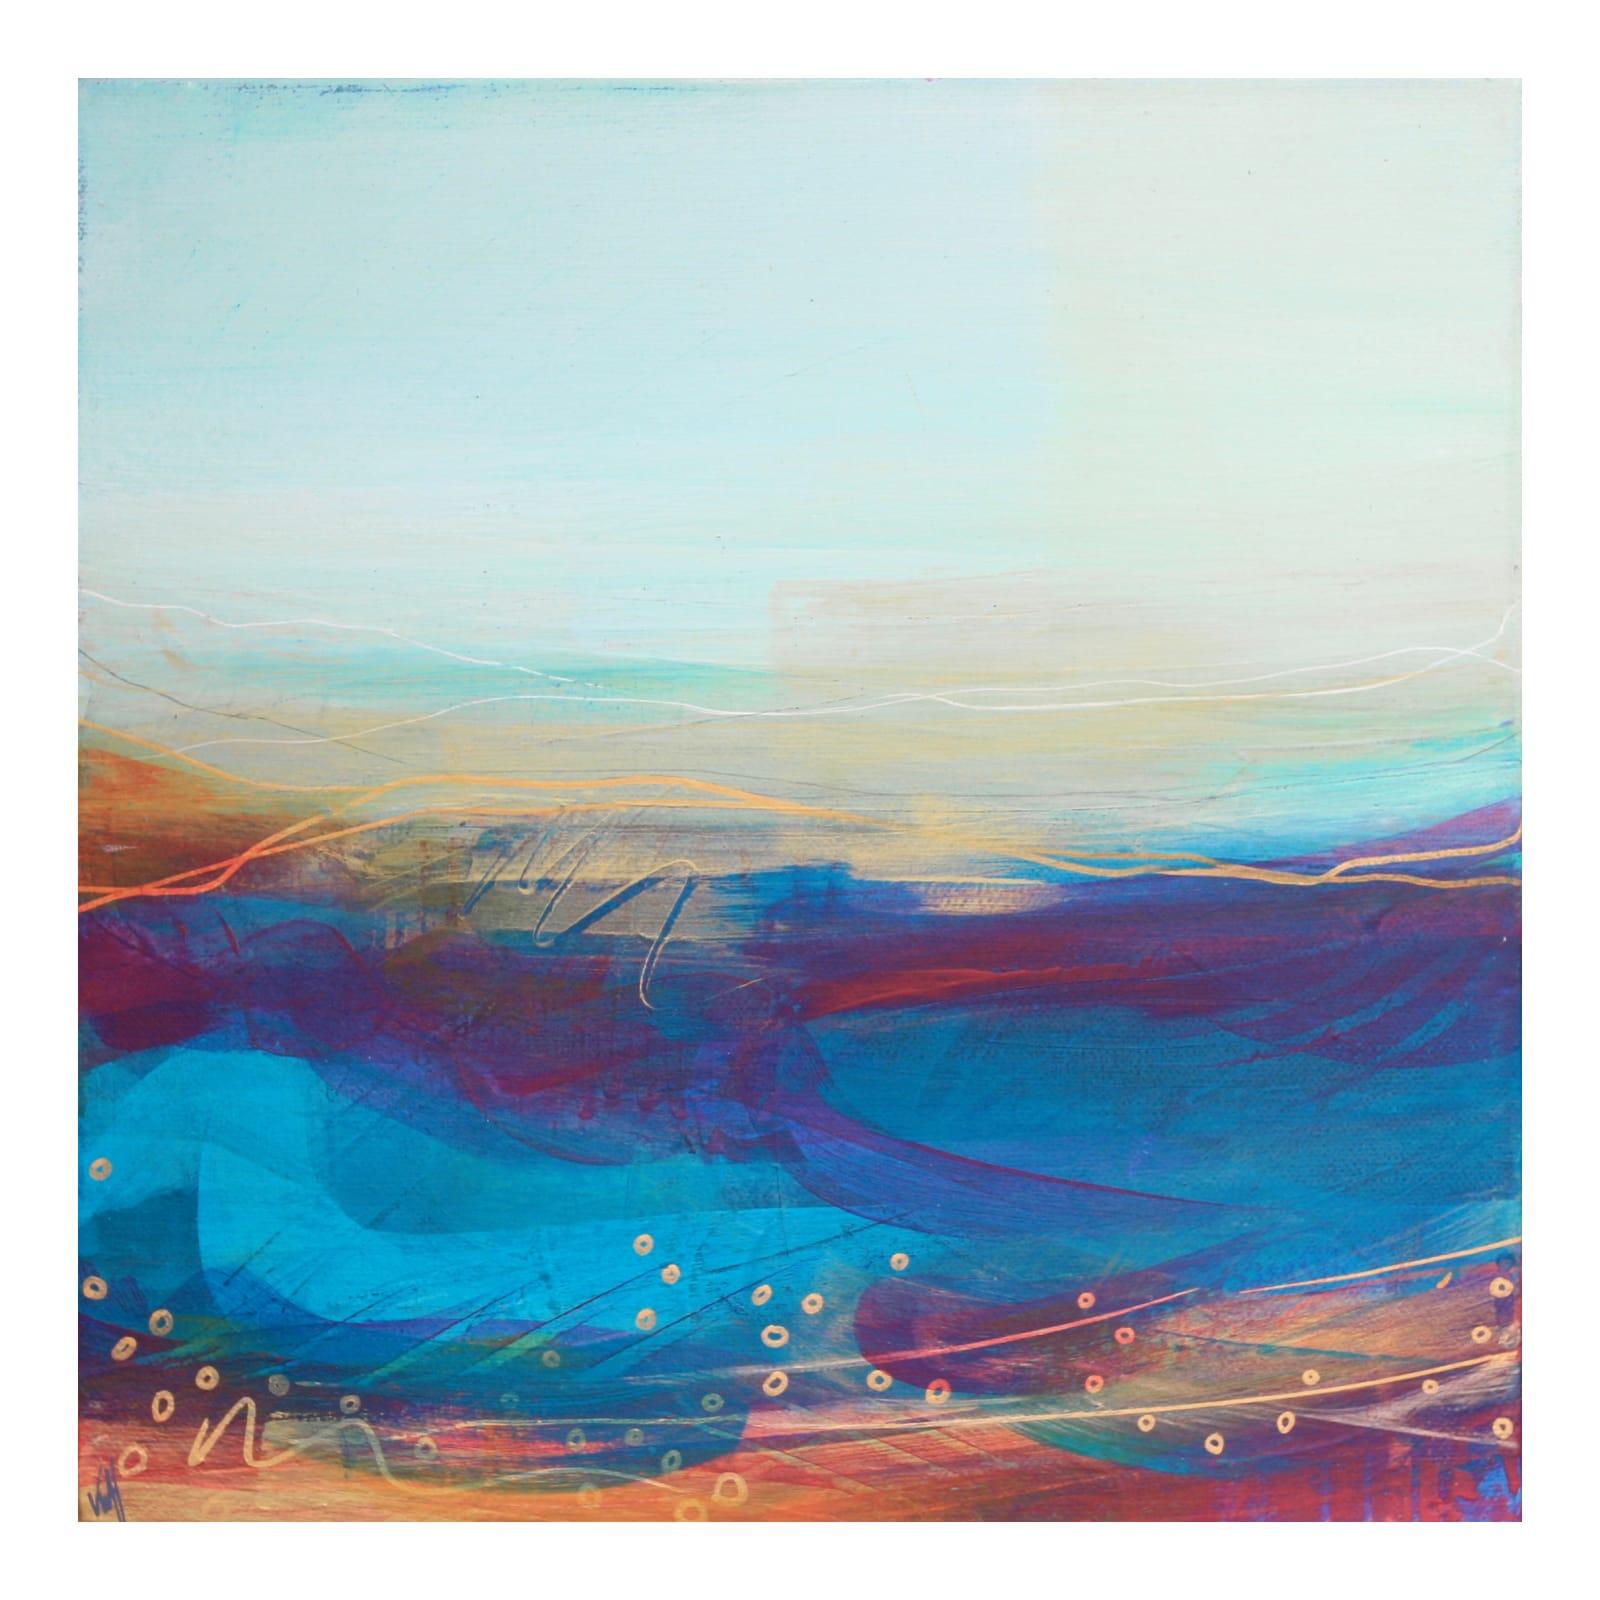 Victoria Wylie, Slow Tide, Inverbervie